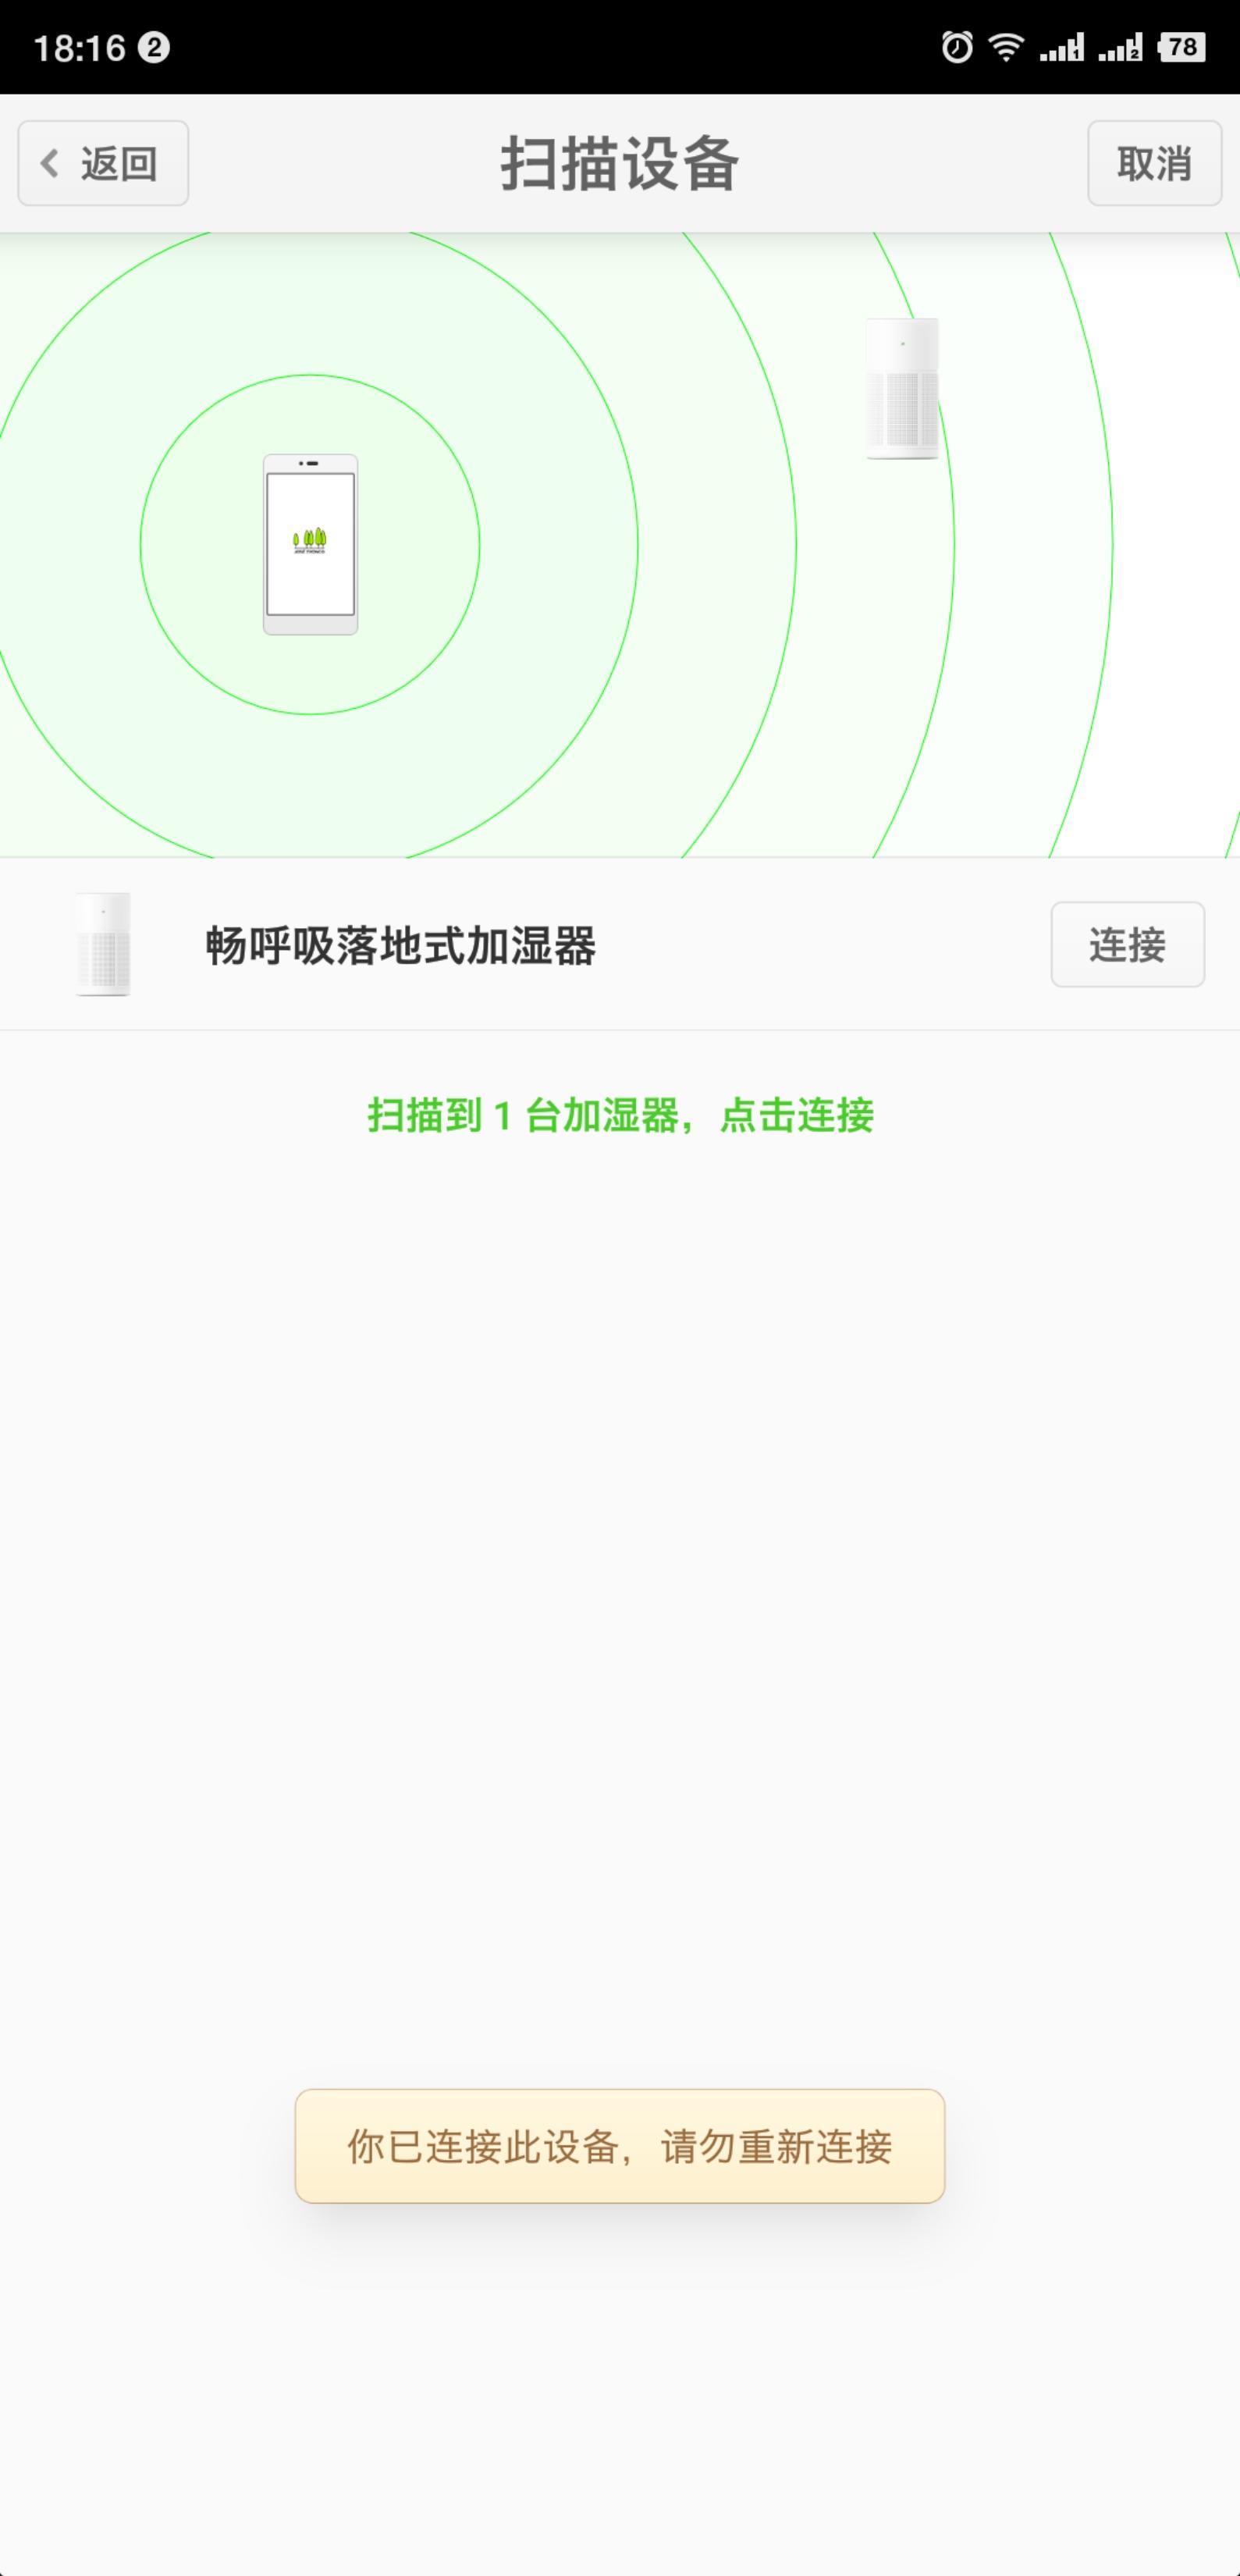 Screenshot_2019-01-15-18-16-58-832_???.png